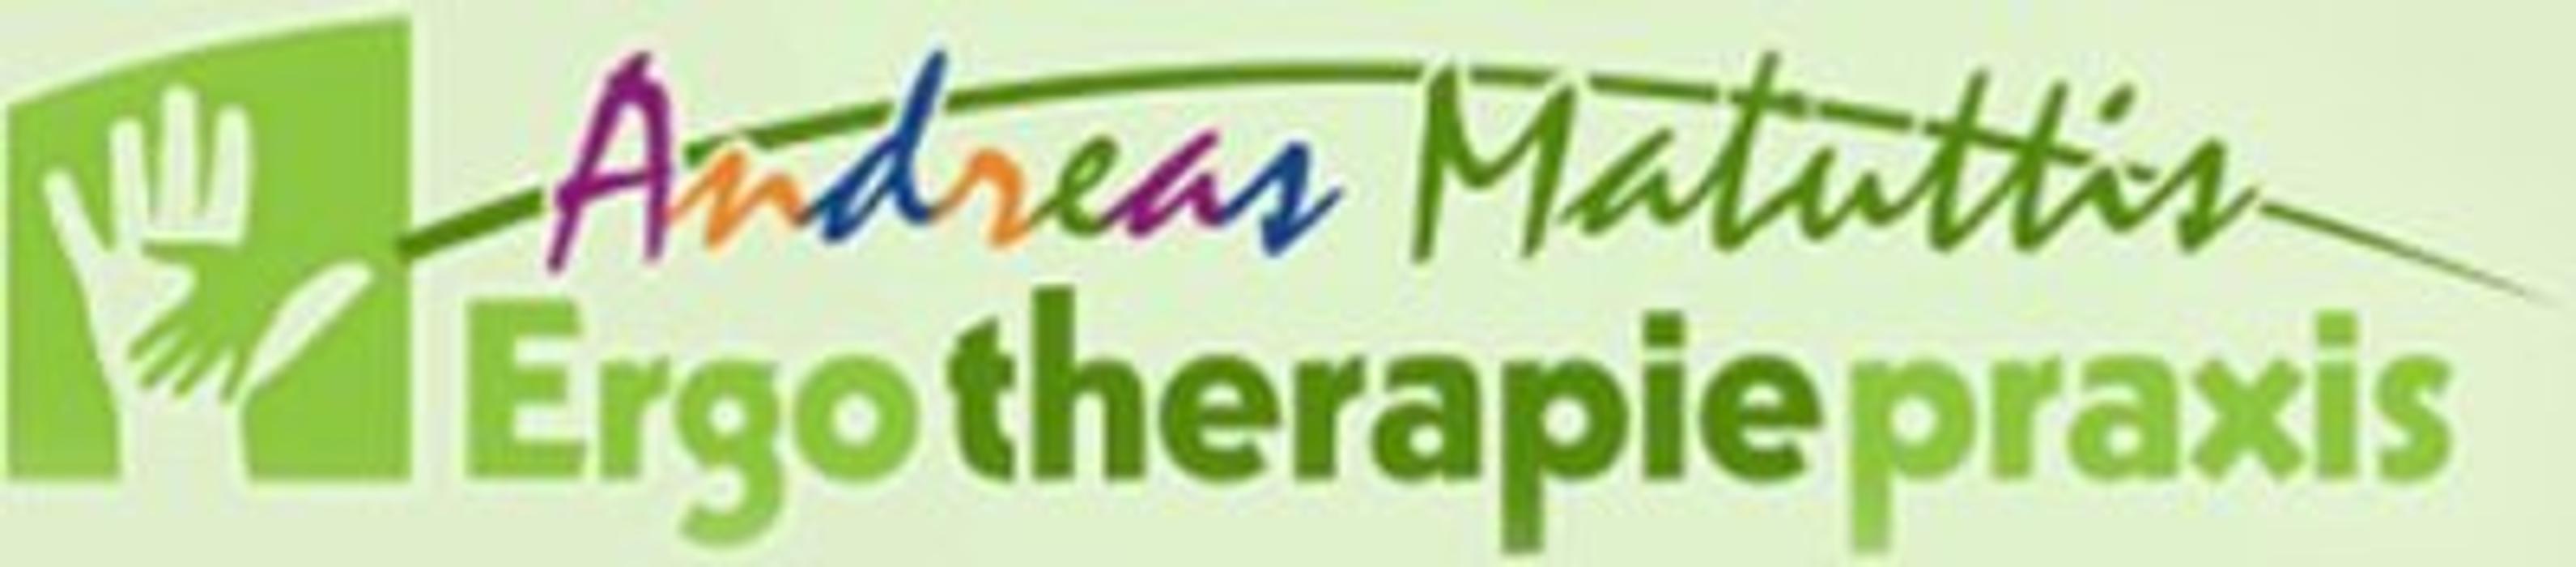 Bild zu Ergotherapie Praxis Andreas Matuttis in Villingen Schwenningen